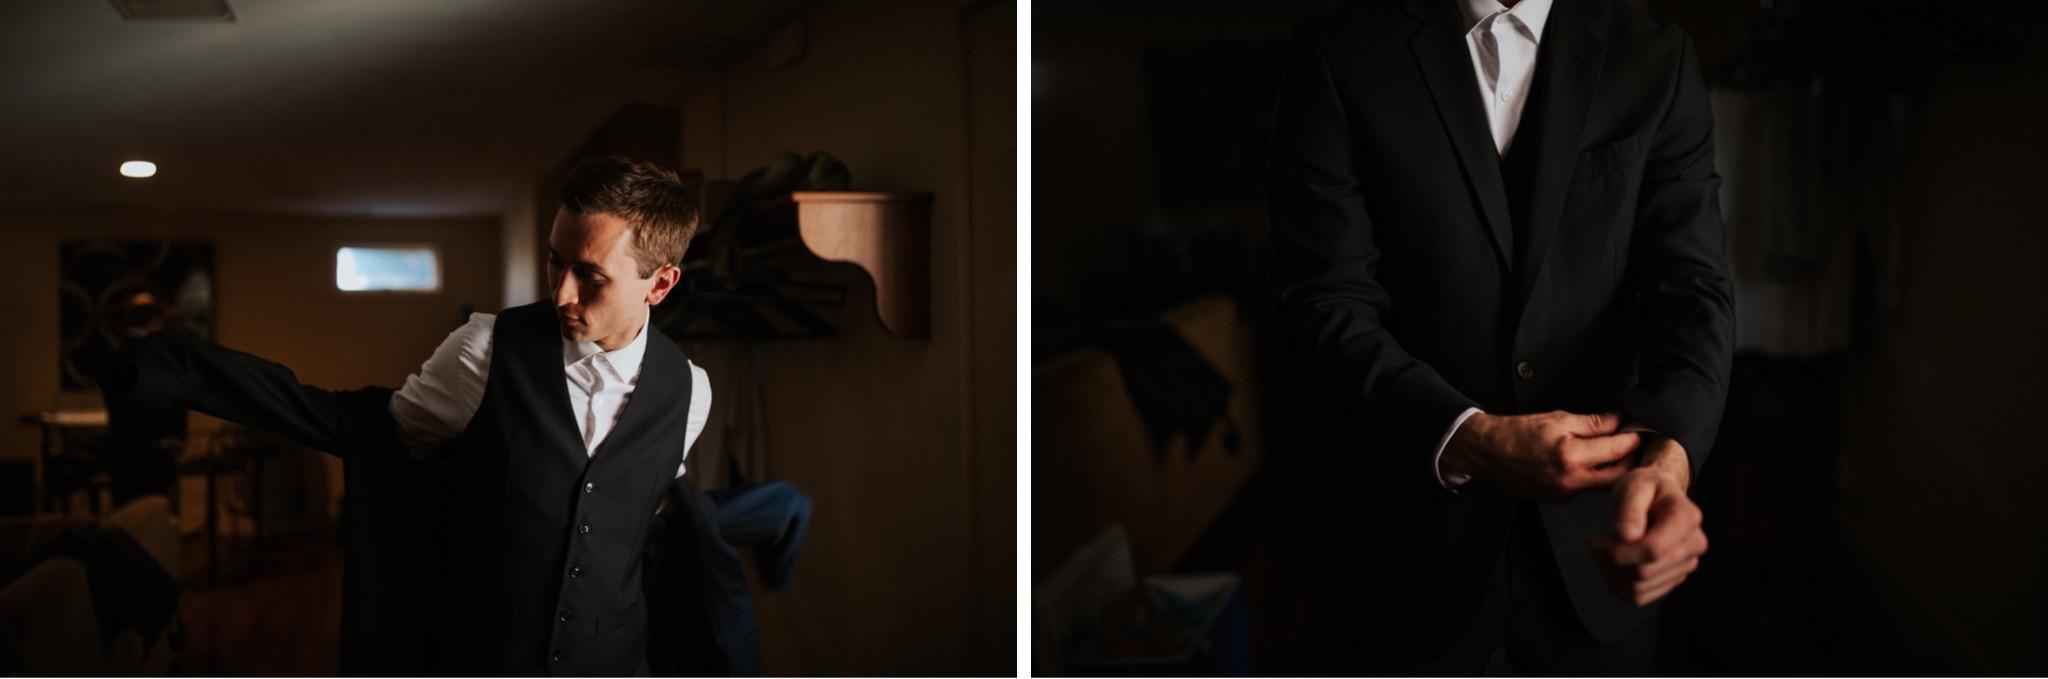 15_West Manor Estate Weddings - Pat Cori Photography-33_West Manor Estate Weddings - Pat Cori Photography-35_Portraits_PatCoriPhotography_groom_VirginiaWeddingPhotographer_WestManorEstate_gettingready.jpg